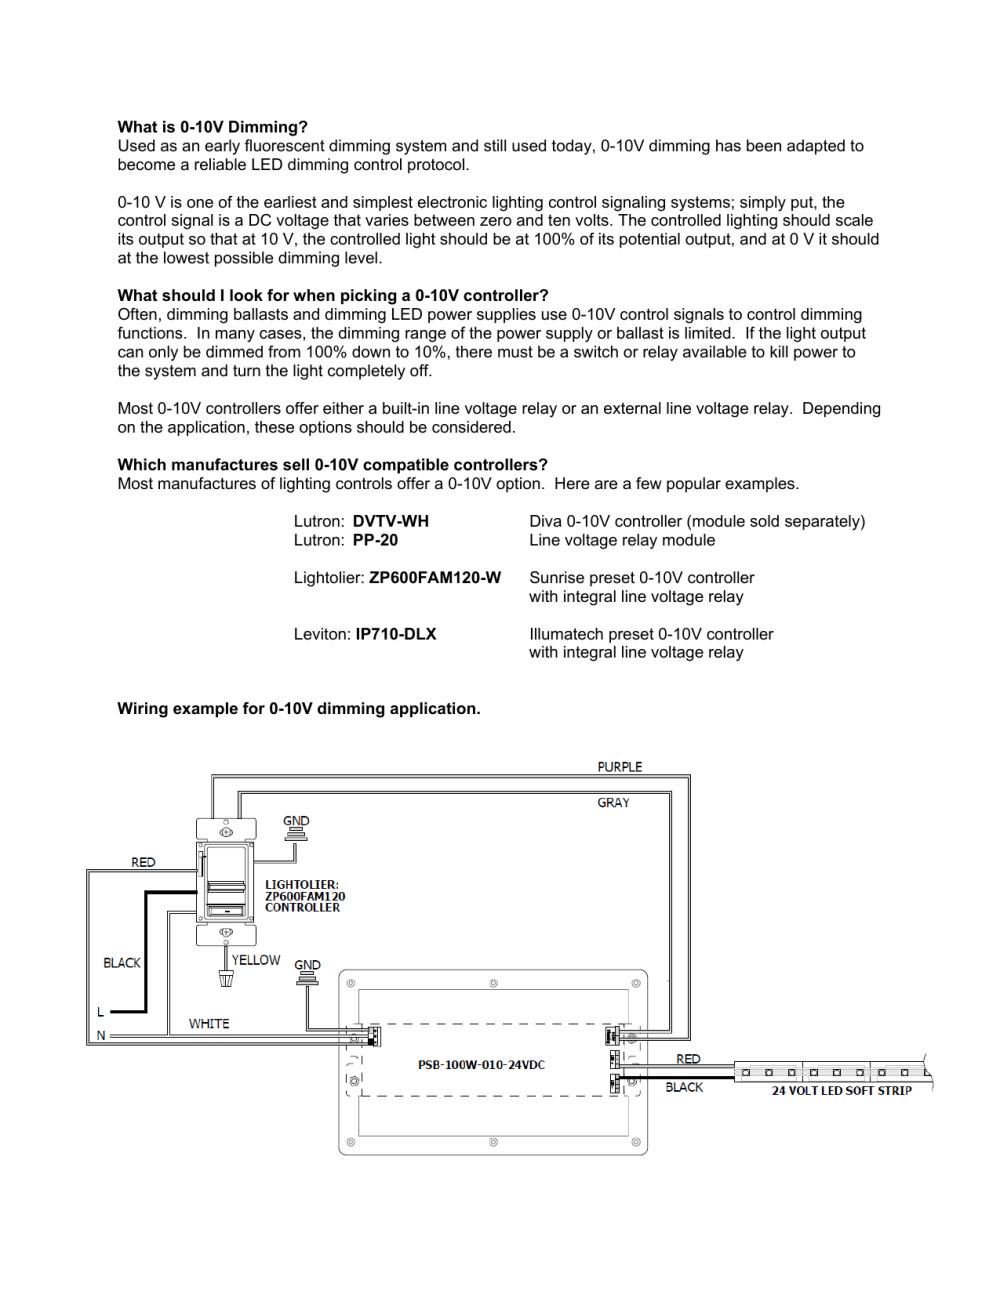 medium resolution of leviton ip710 wiring diagram lf